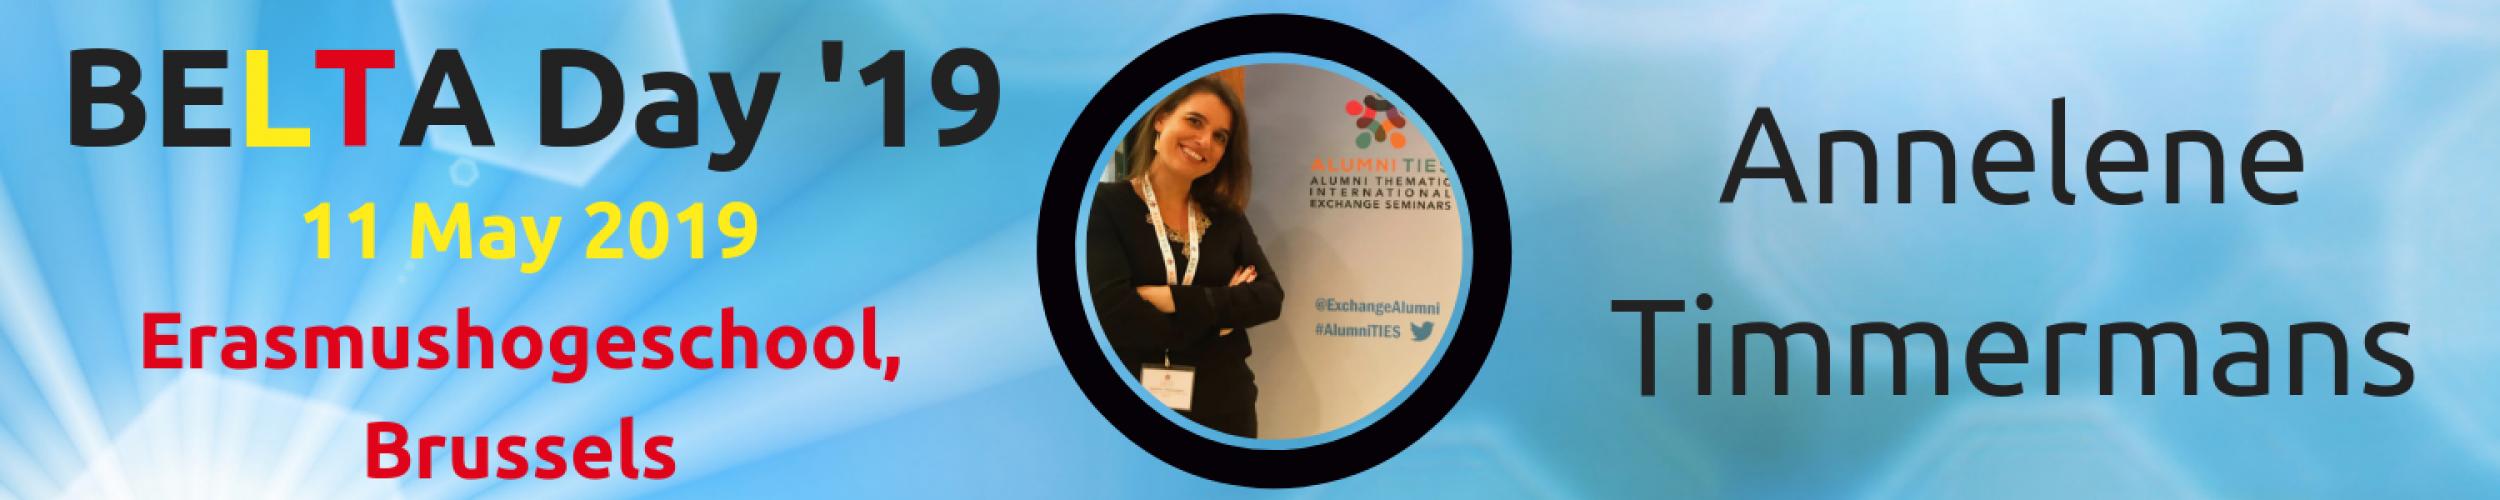 BELTA Day '19: Meet the Speakers: Annelene Timmermans